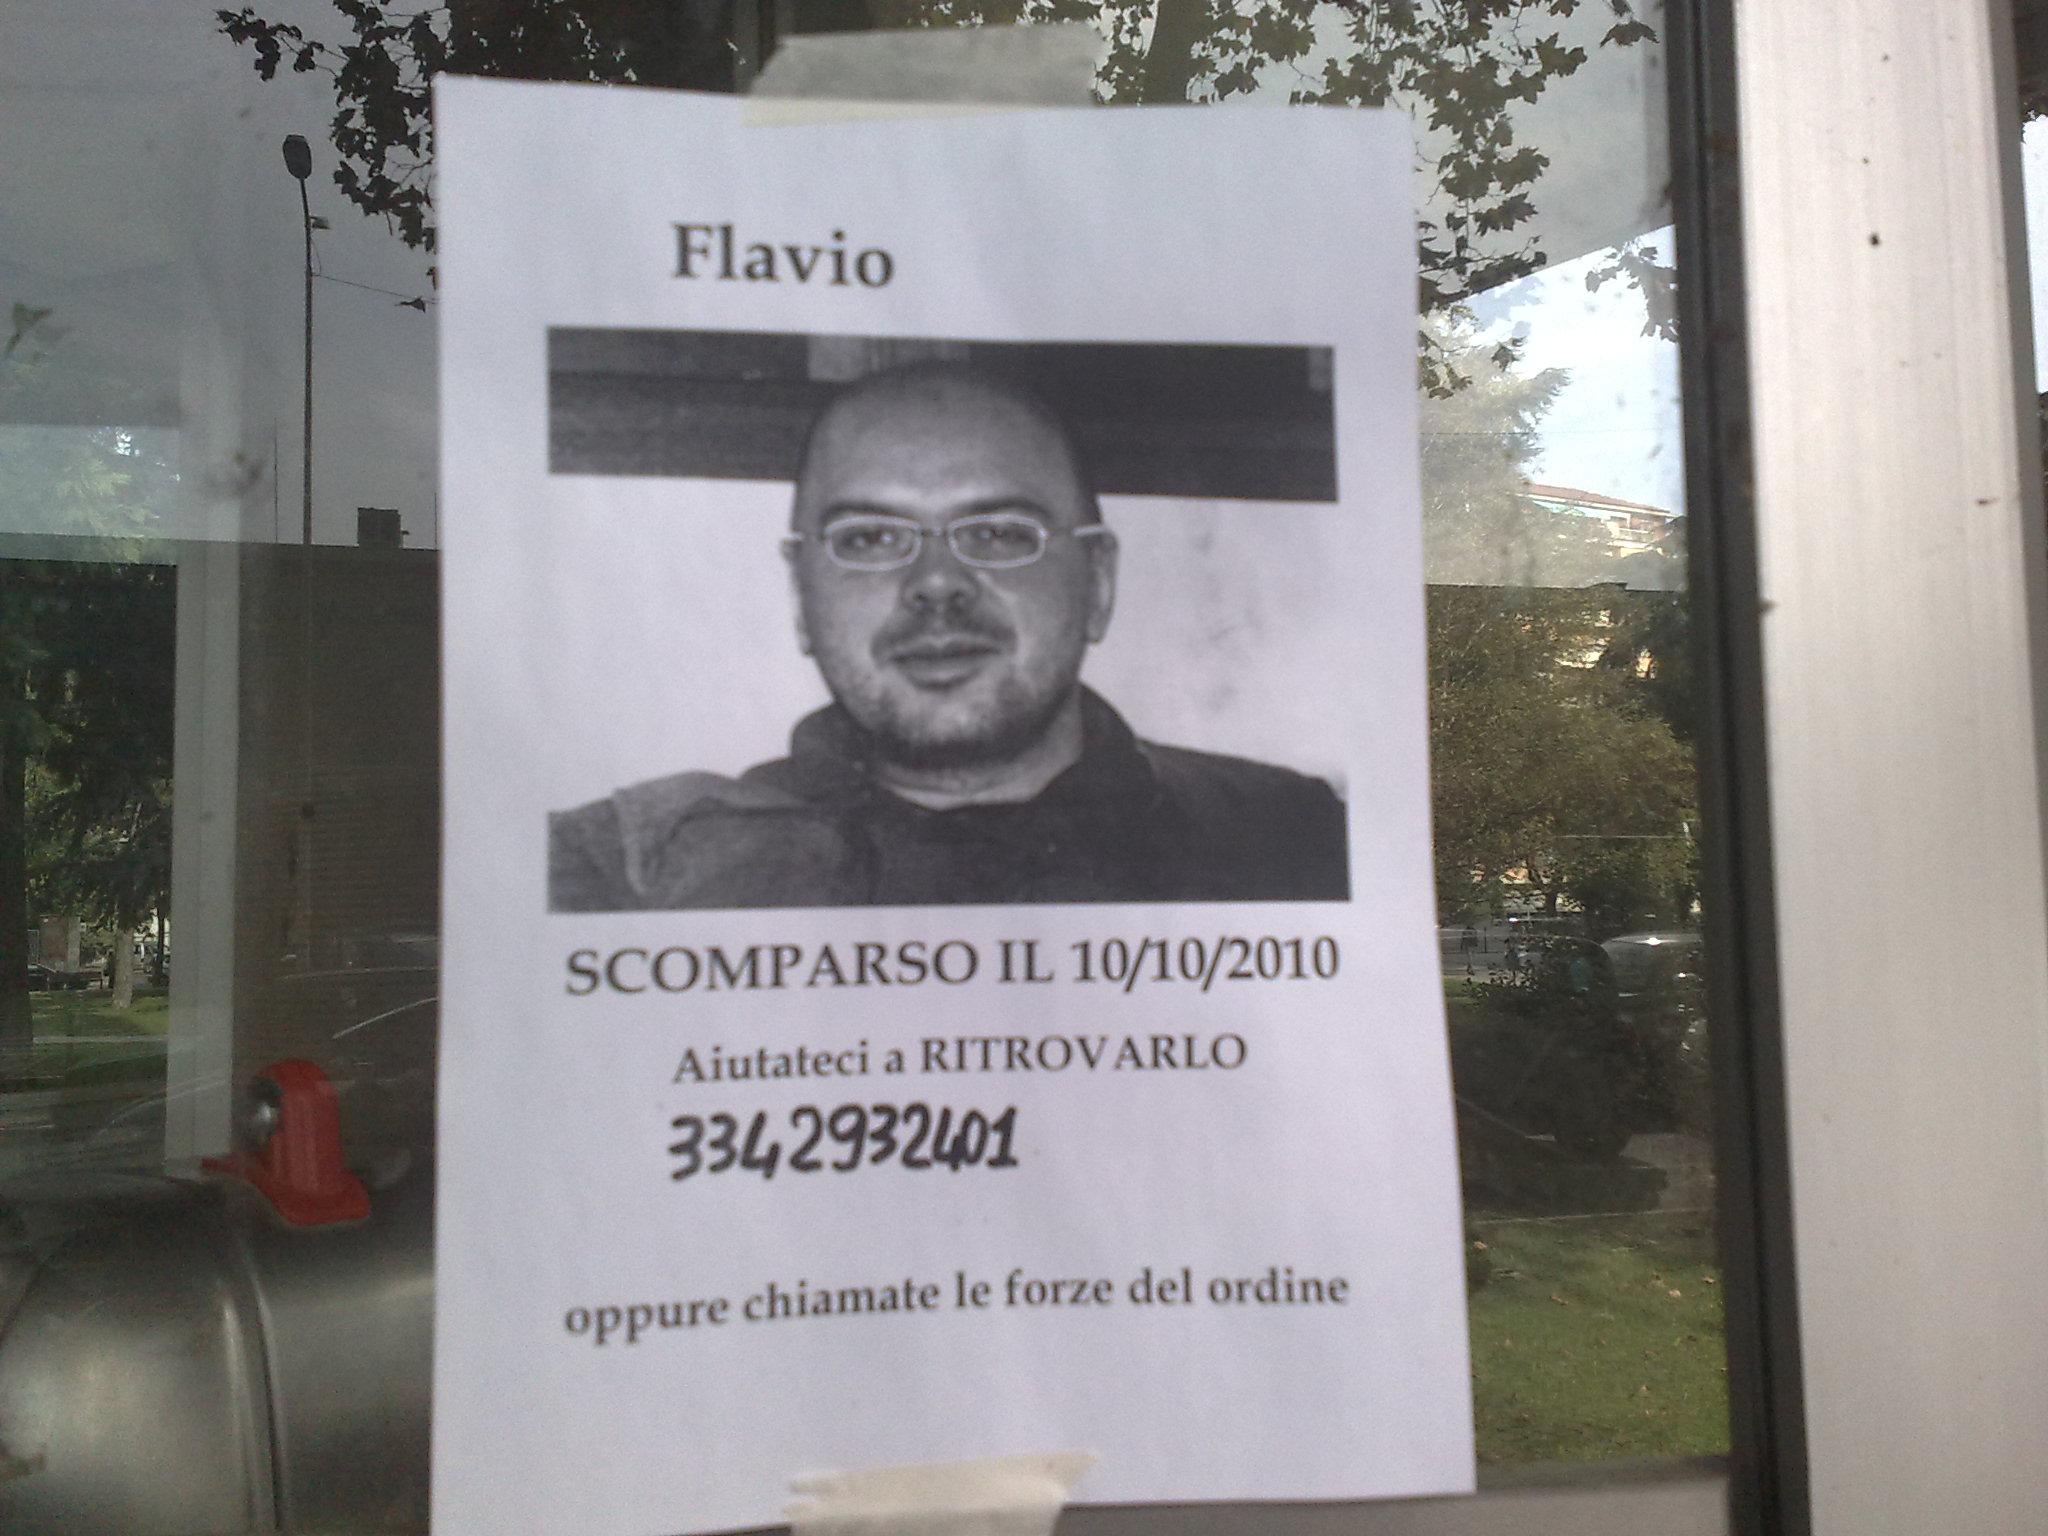 Flavio Carrideo